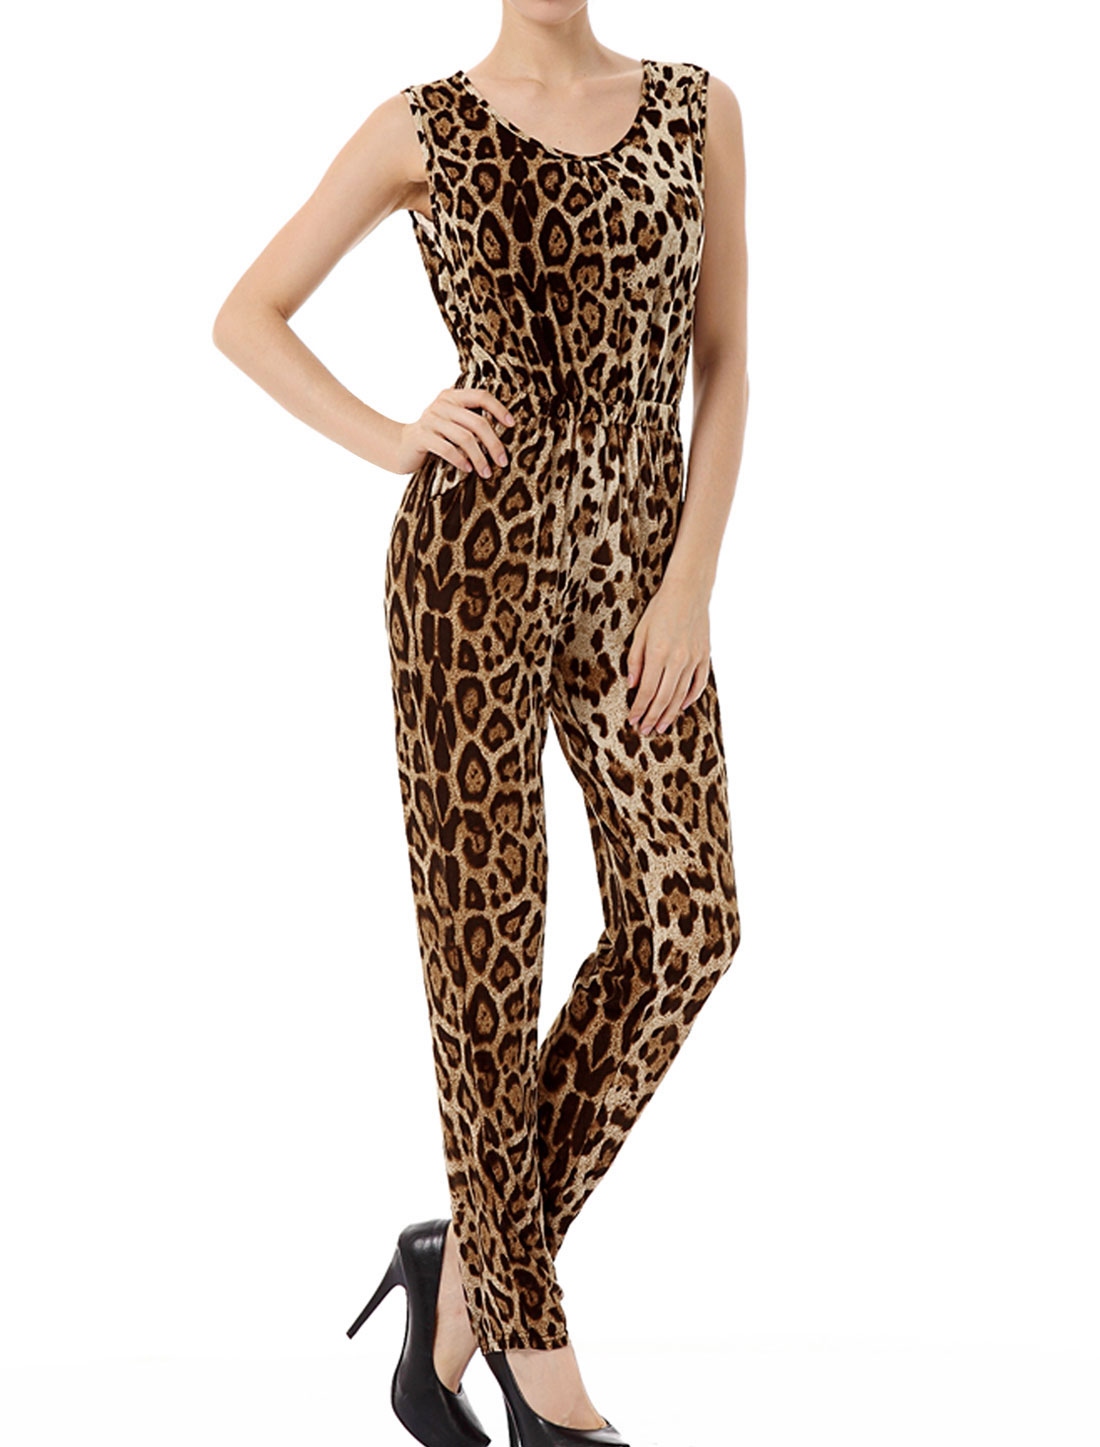 Women Stretchy Waist All Over Leopard Pattern Jumpsuit Brown Black XL